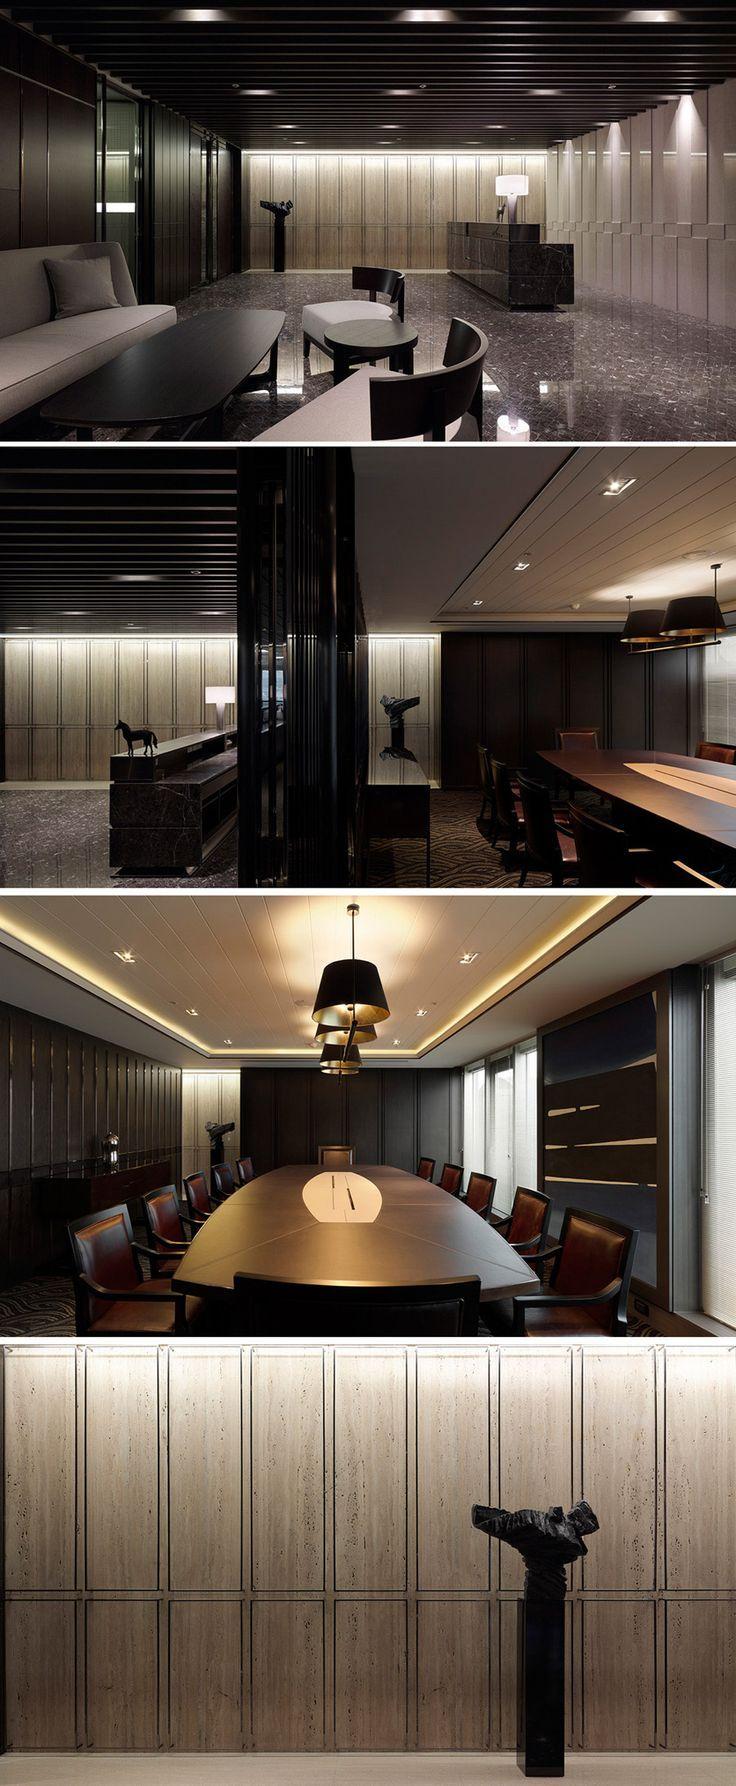 Meeting room idea